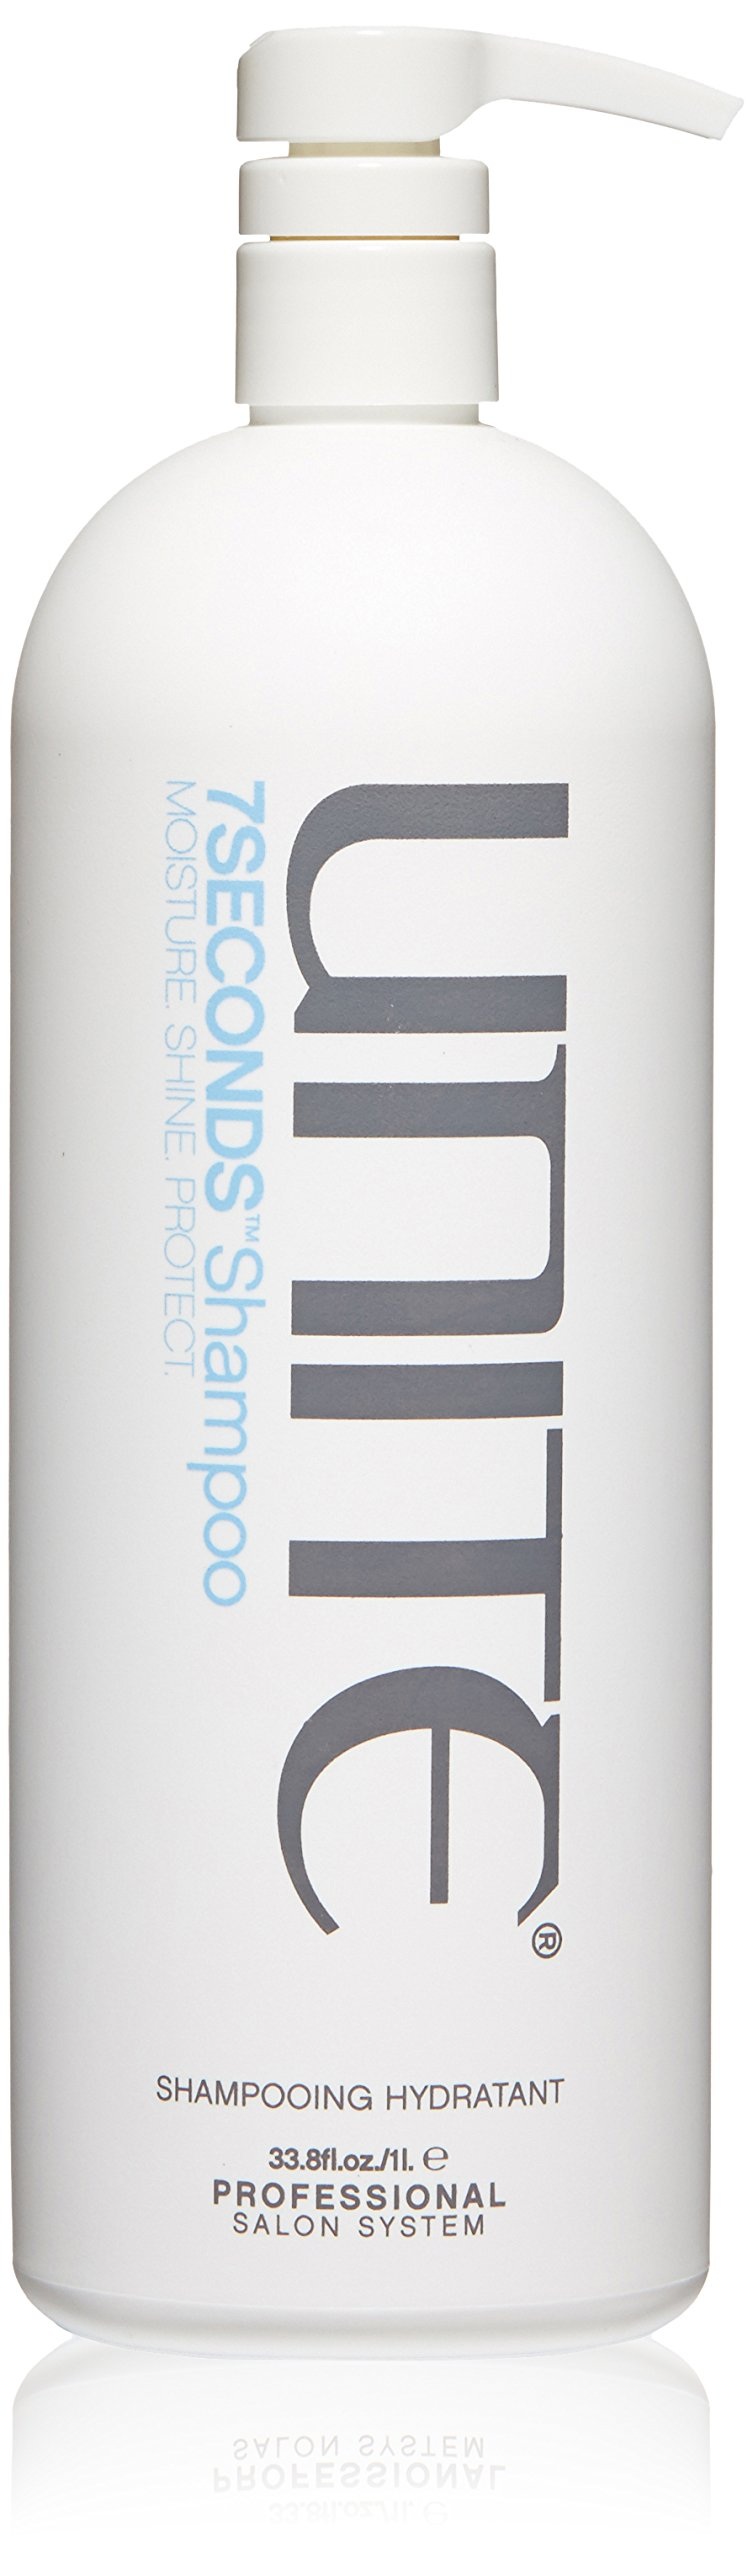 UNITE Hair 7 Seconds Shampoo, 33.8 Fl oz